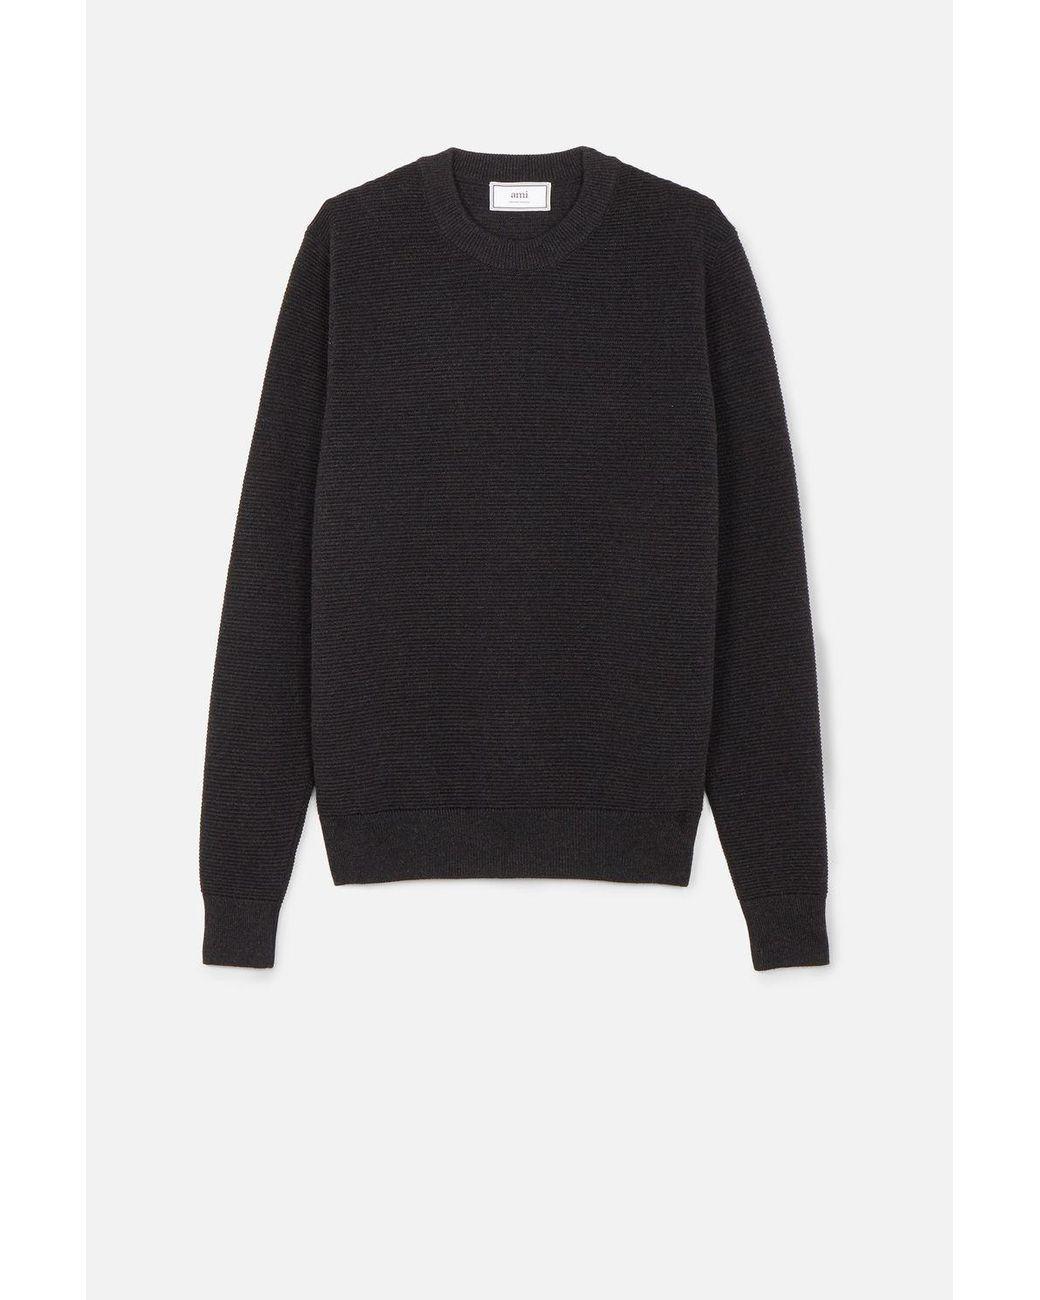 Goodthreads Mens Soft Cotton Rib Stitch Crewneck Sweater Brand